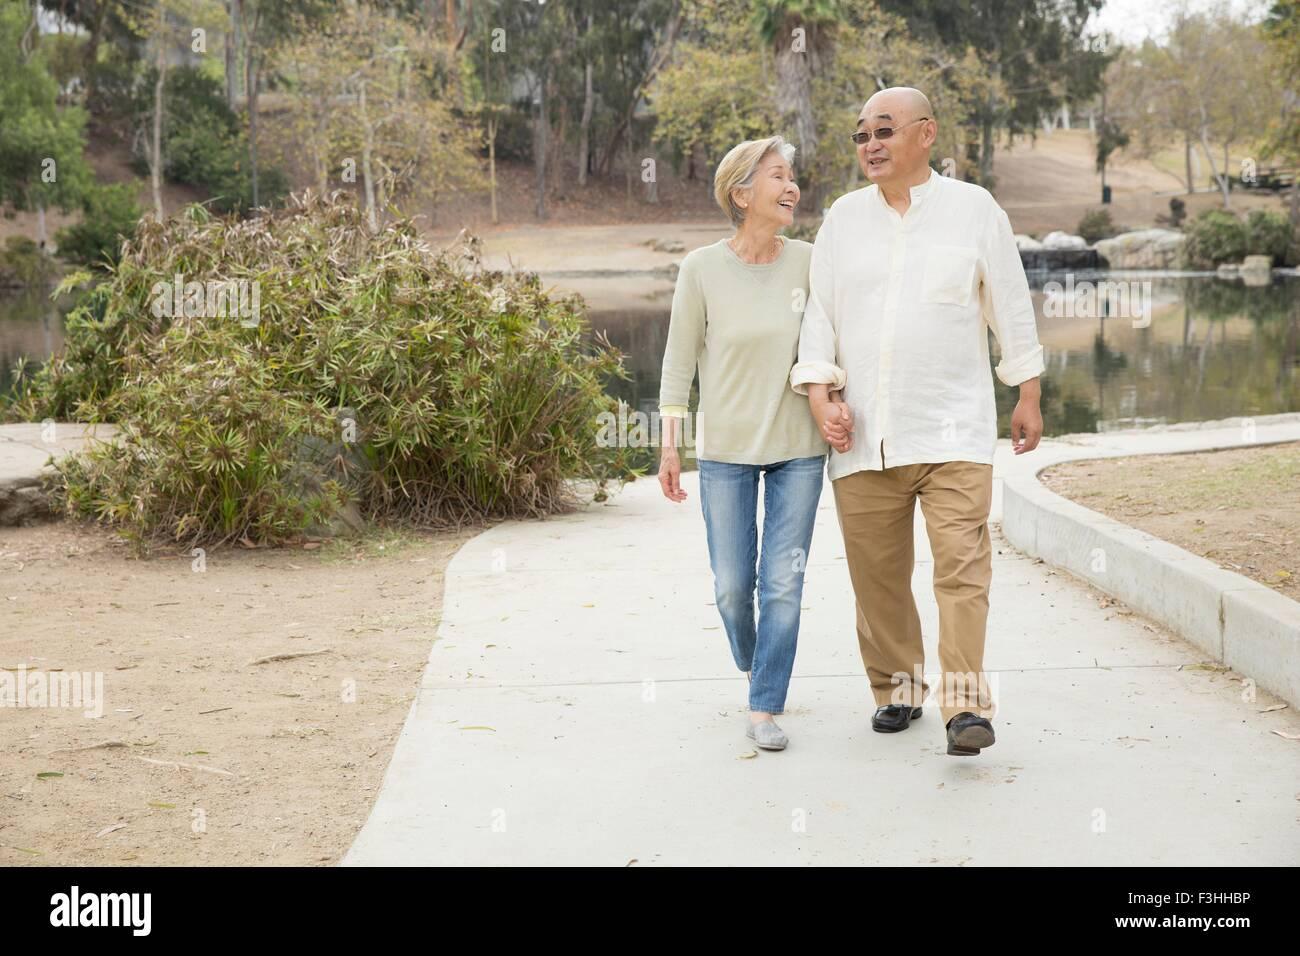 Couple le long cheminement, holding hands Banque D'Images